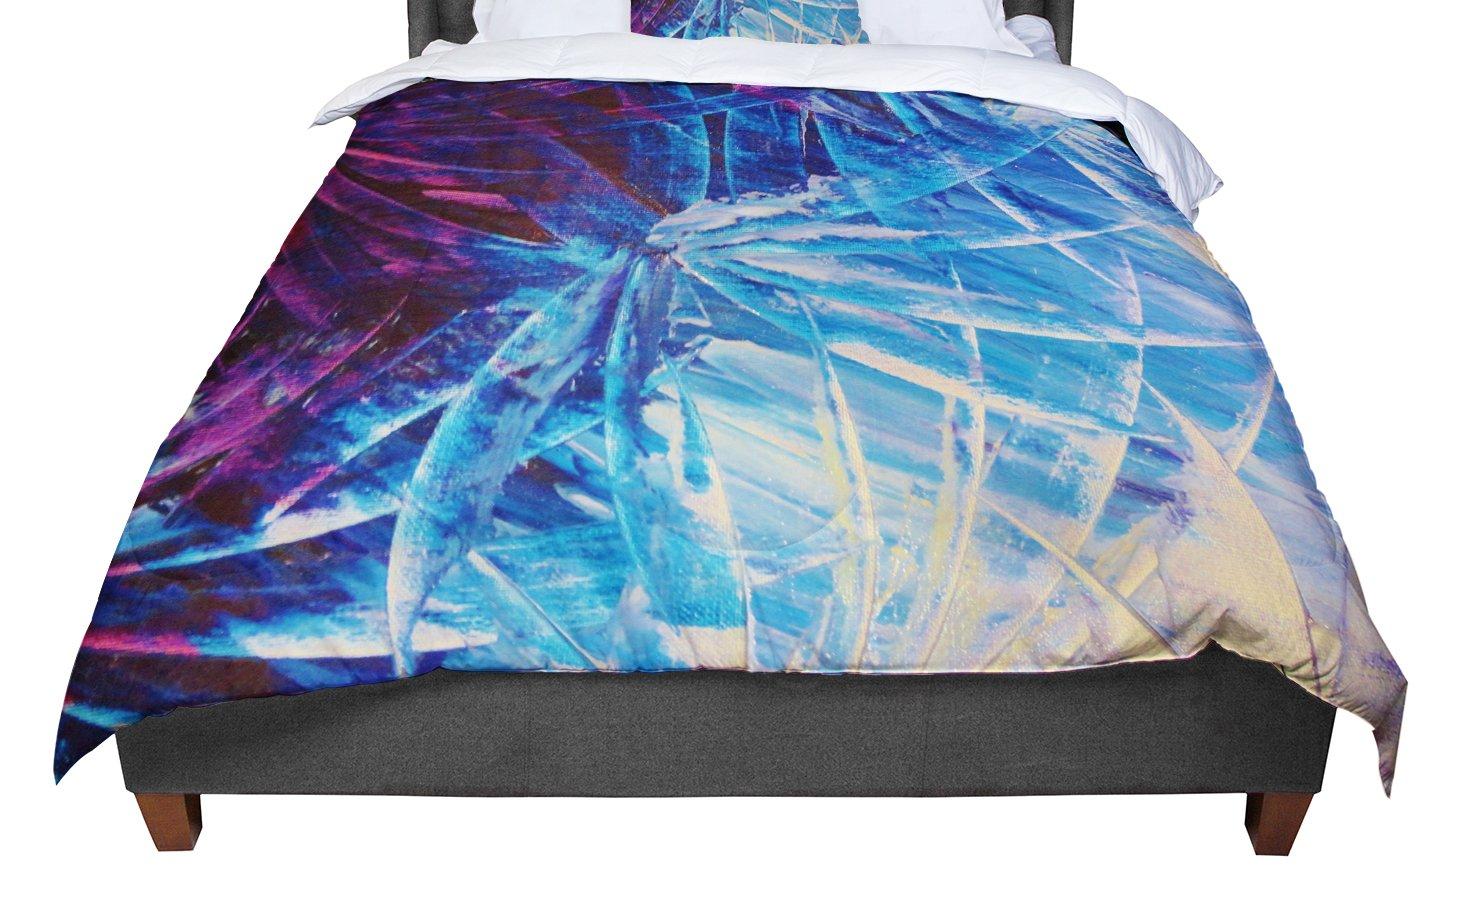 68 X 88 KESS InHouse Ebi Emporium Night Flowers Blue White Twin Comforter